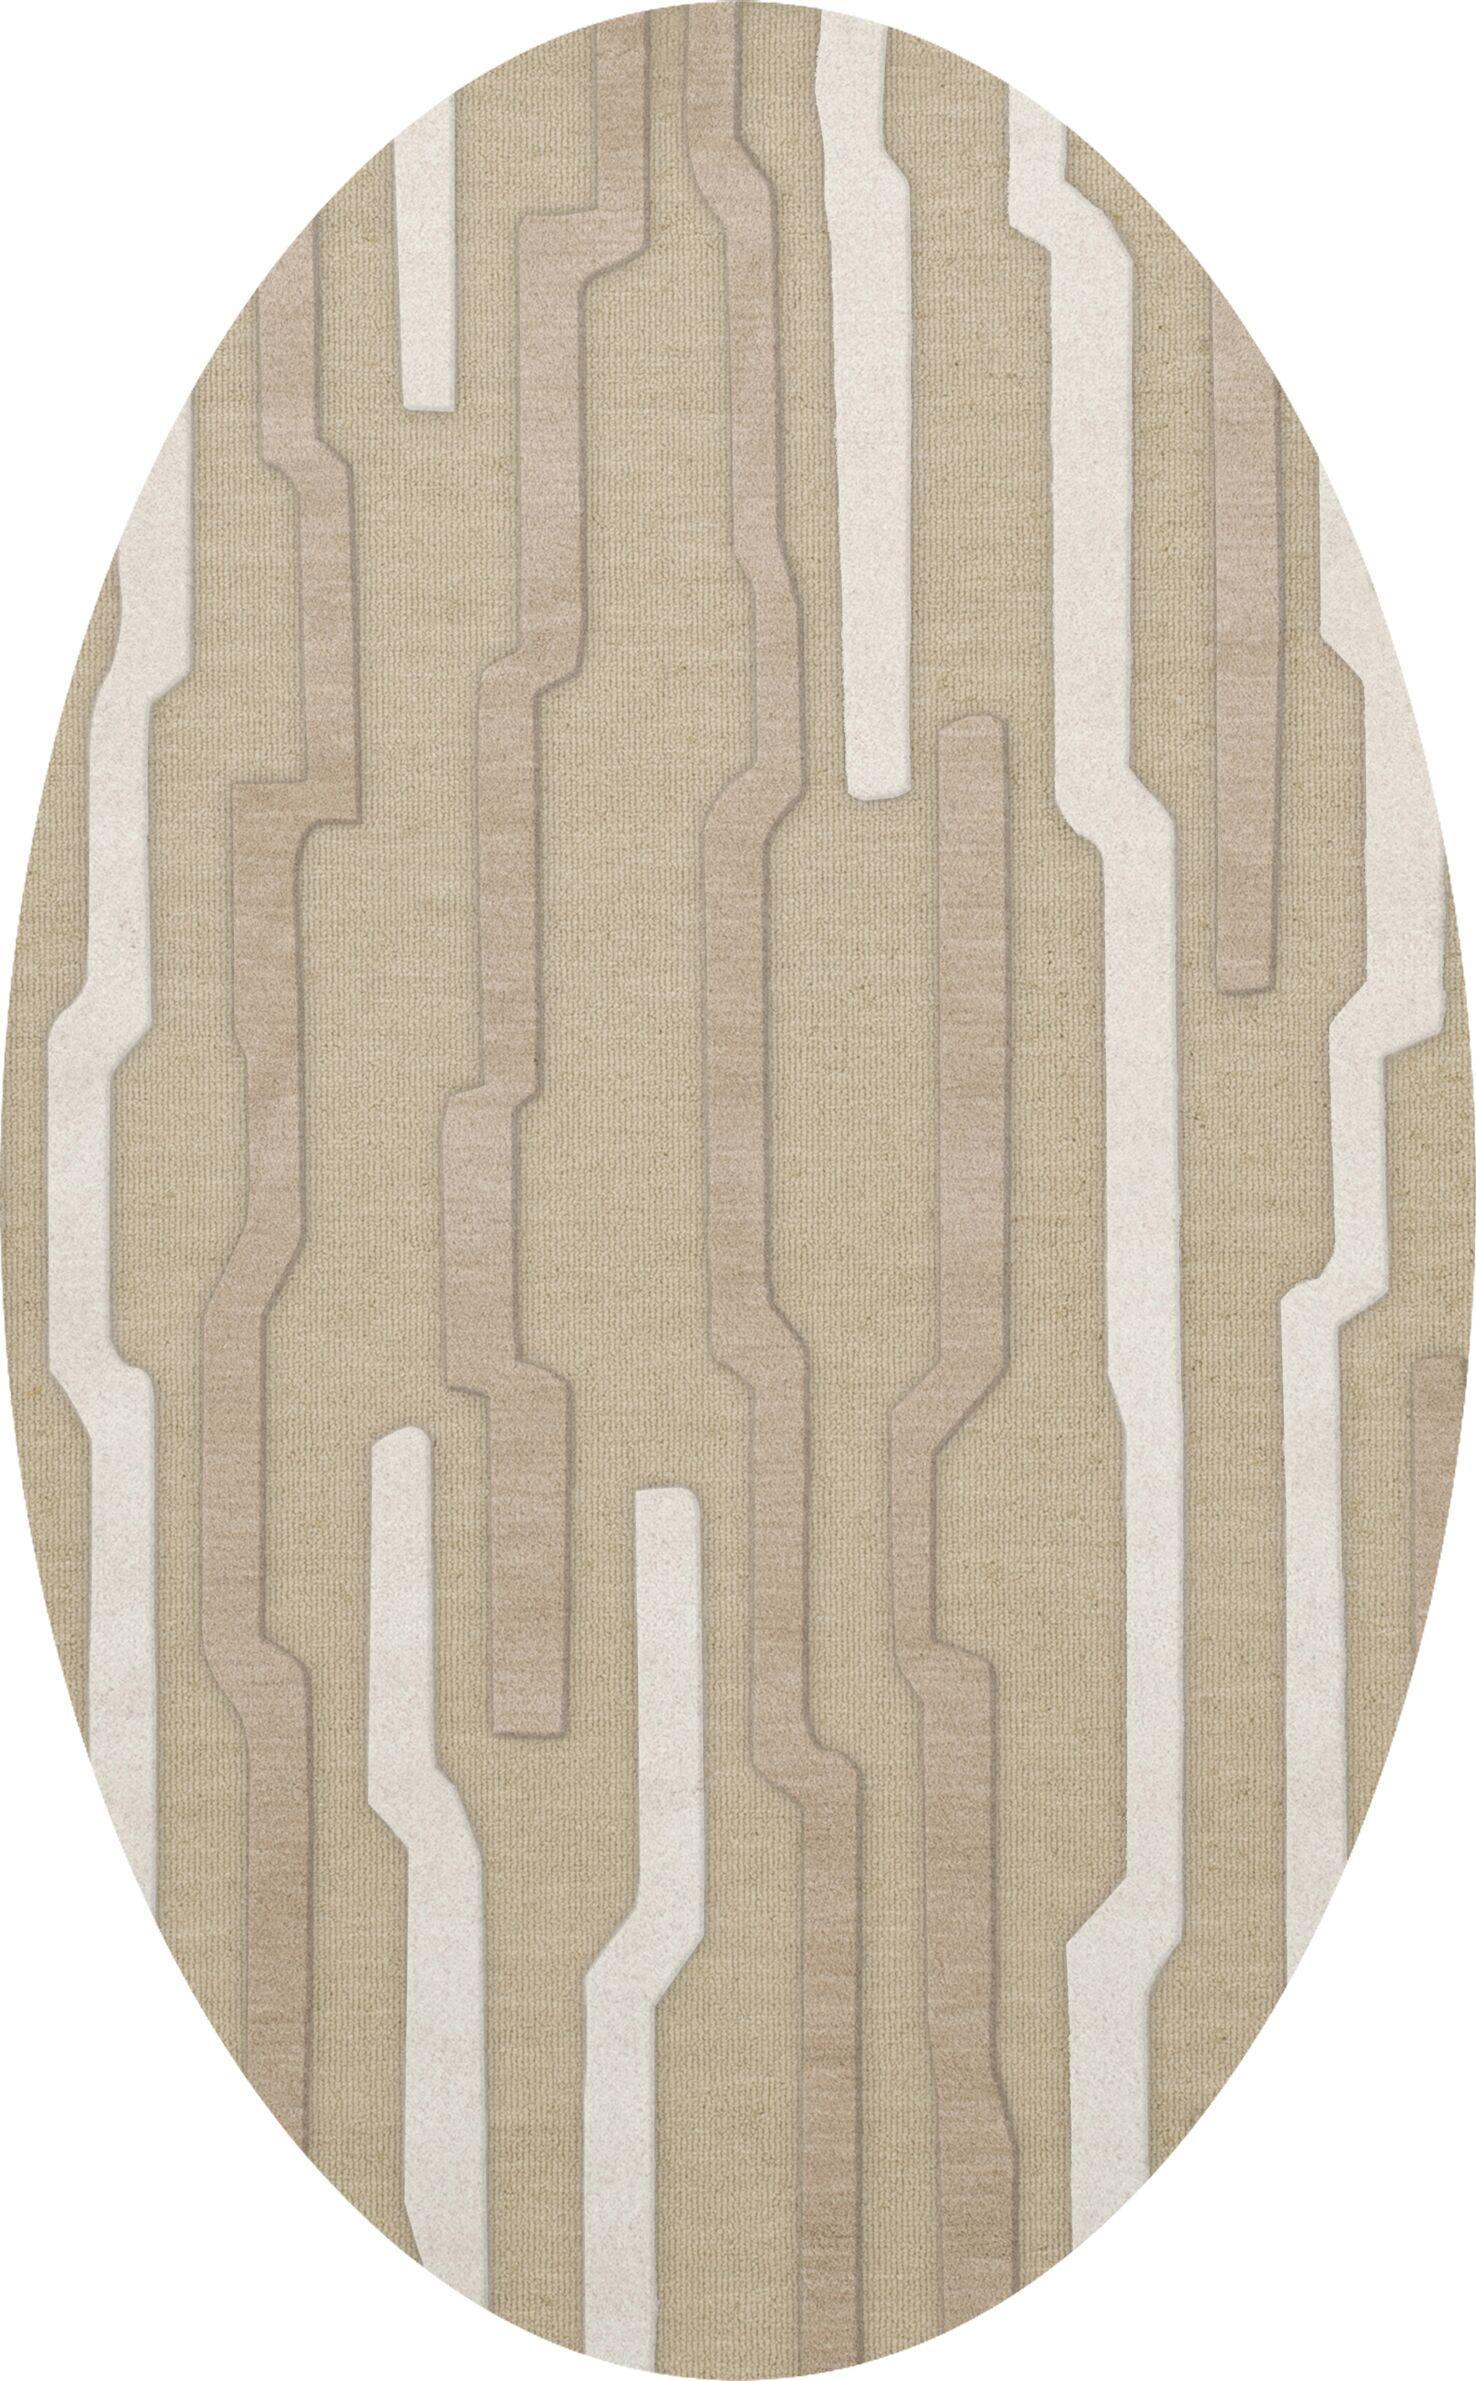 Hartsdale Wool Chopstick Area Rug Rug Size: Oval 6' x 9'